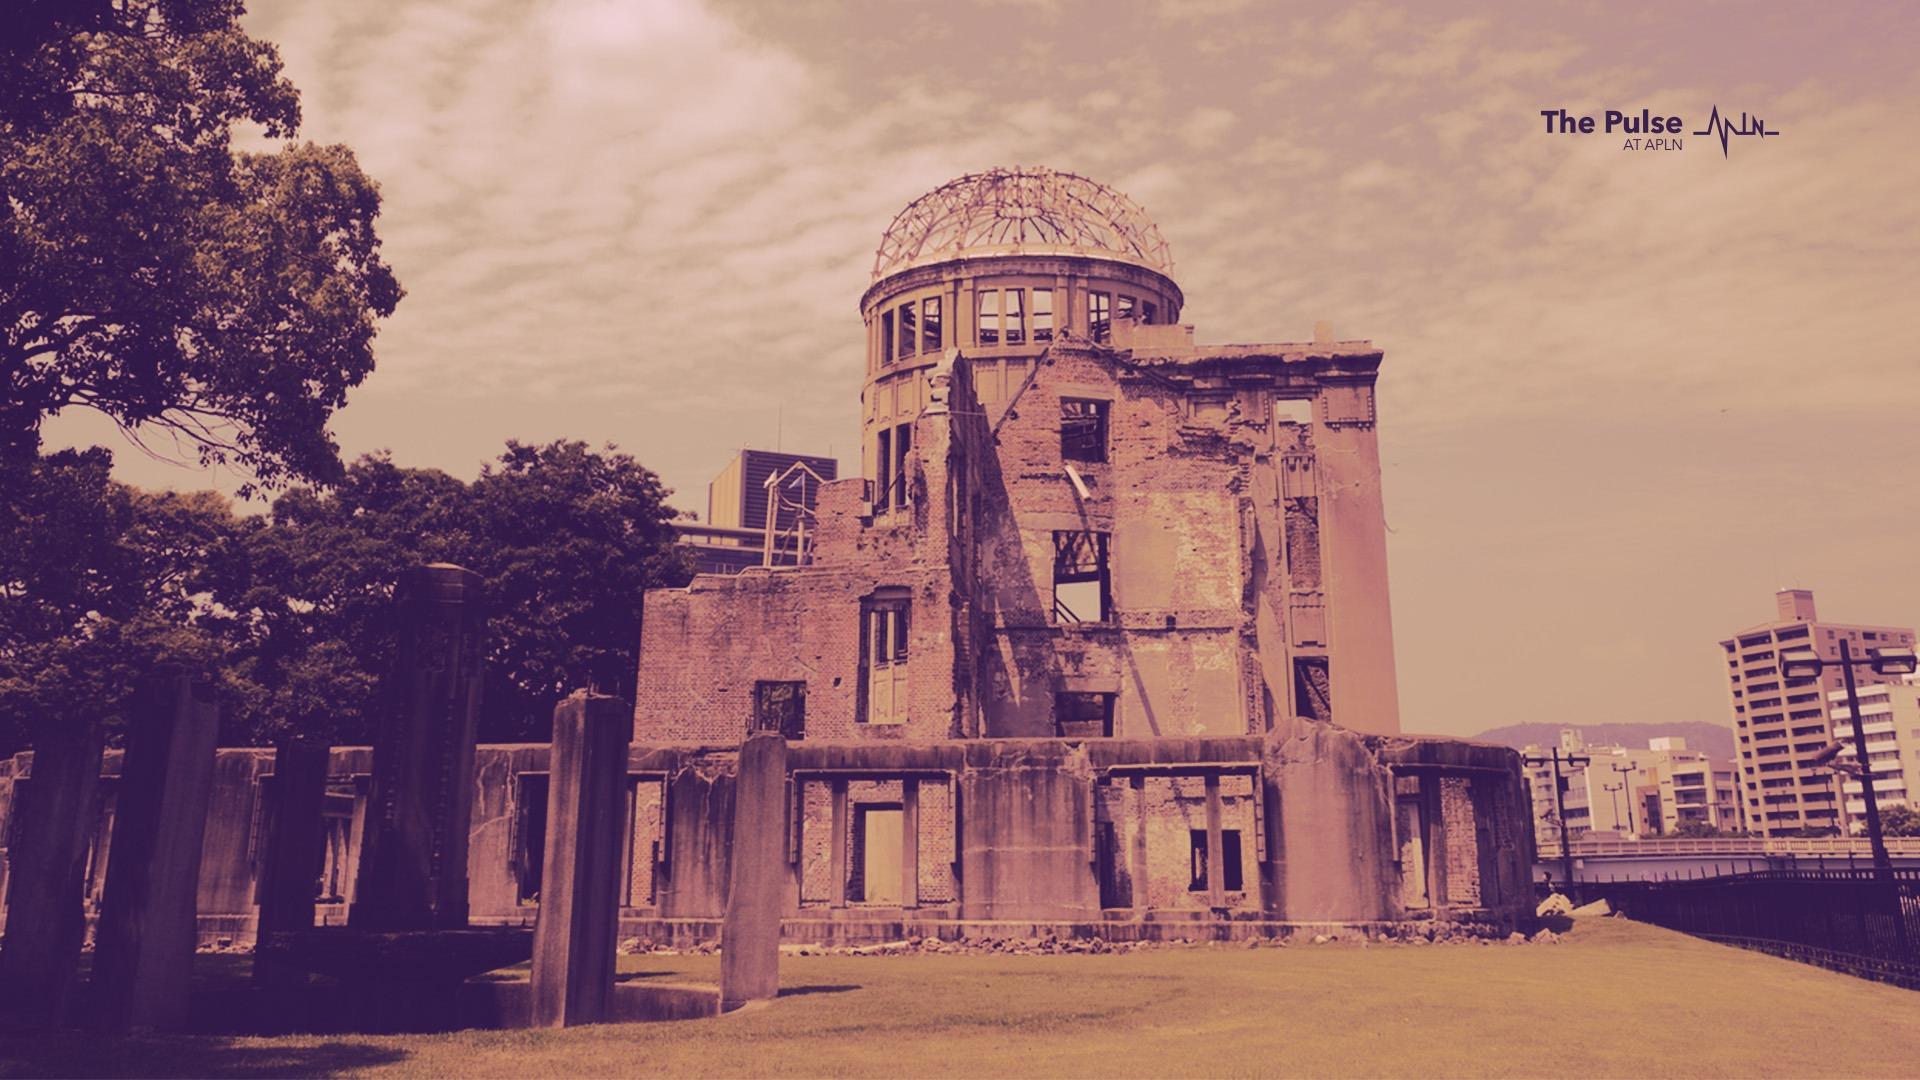 76th Anniversary of Hiroshima and Nagasaki Bombings